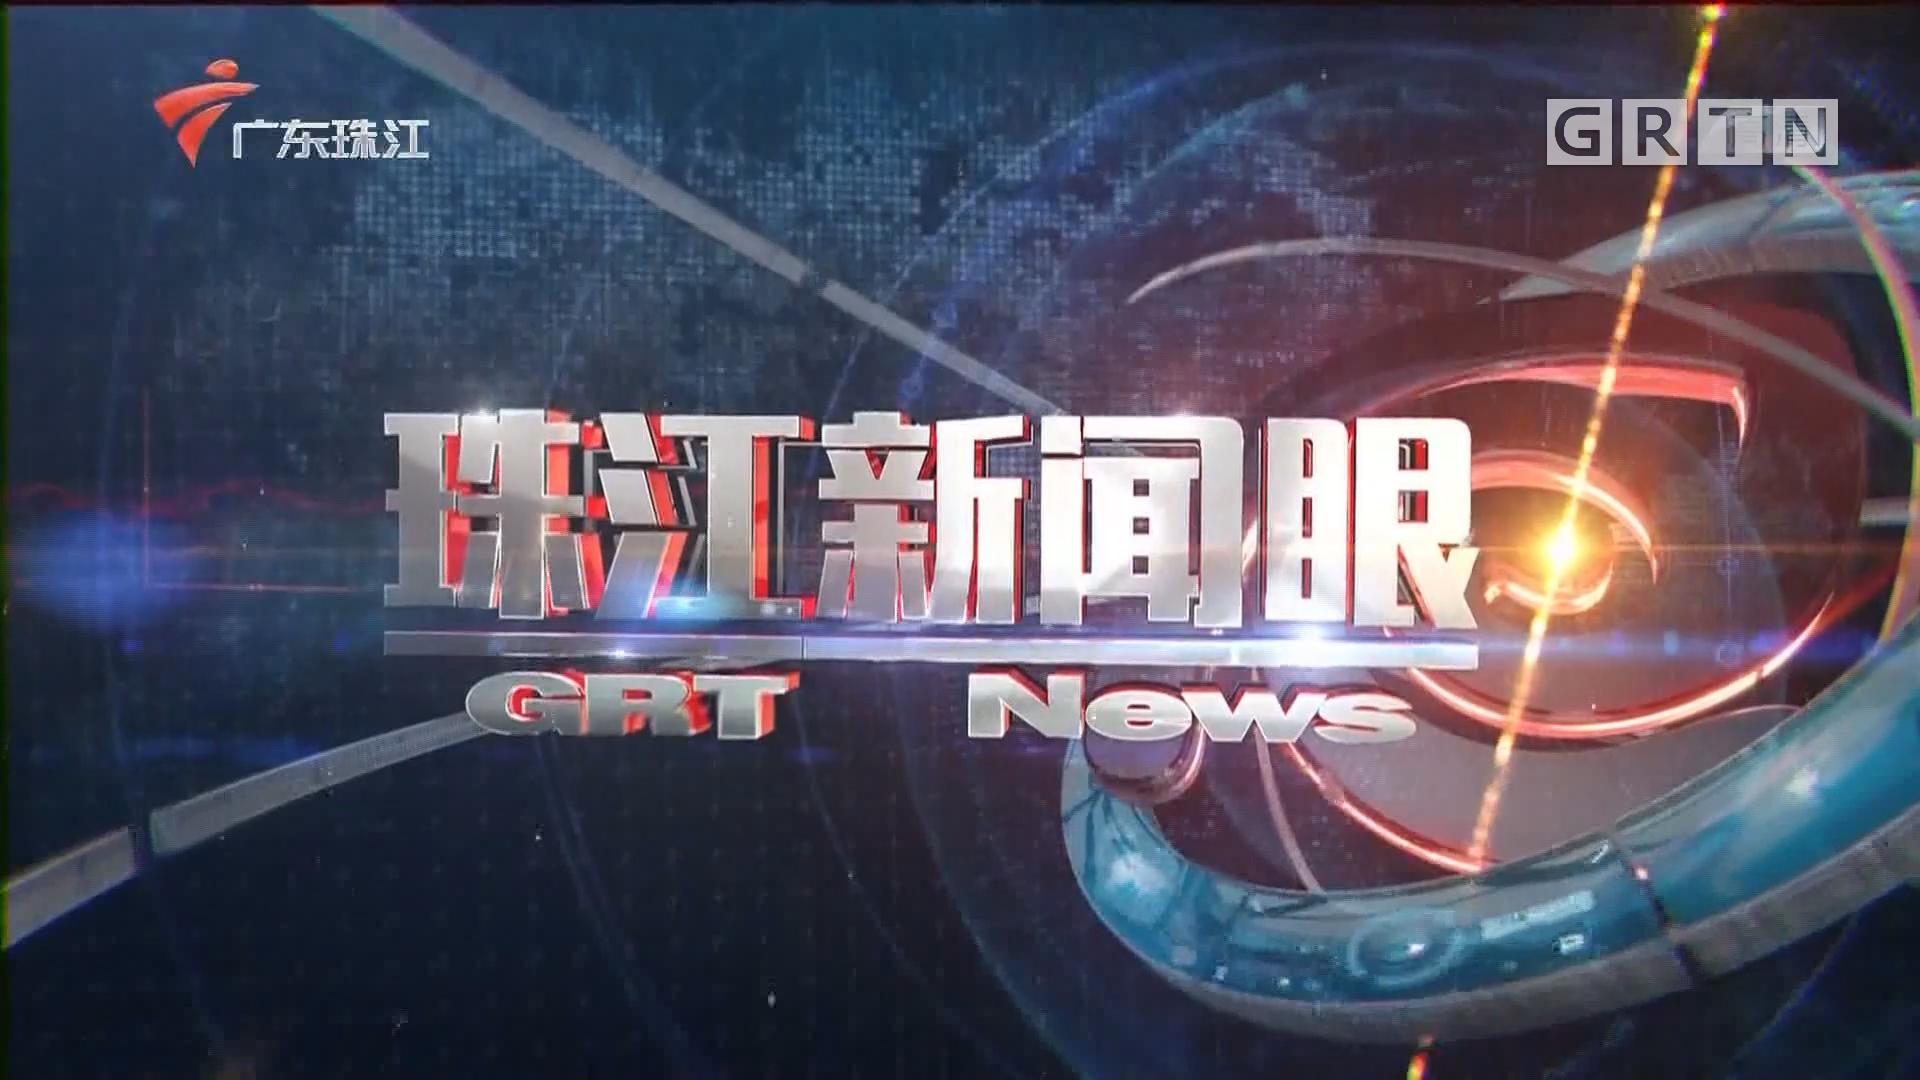 [HD][2020-02-28]珠江新闻眼:国家卫健委:正全力救治危重症患者 血浆疗法有效